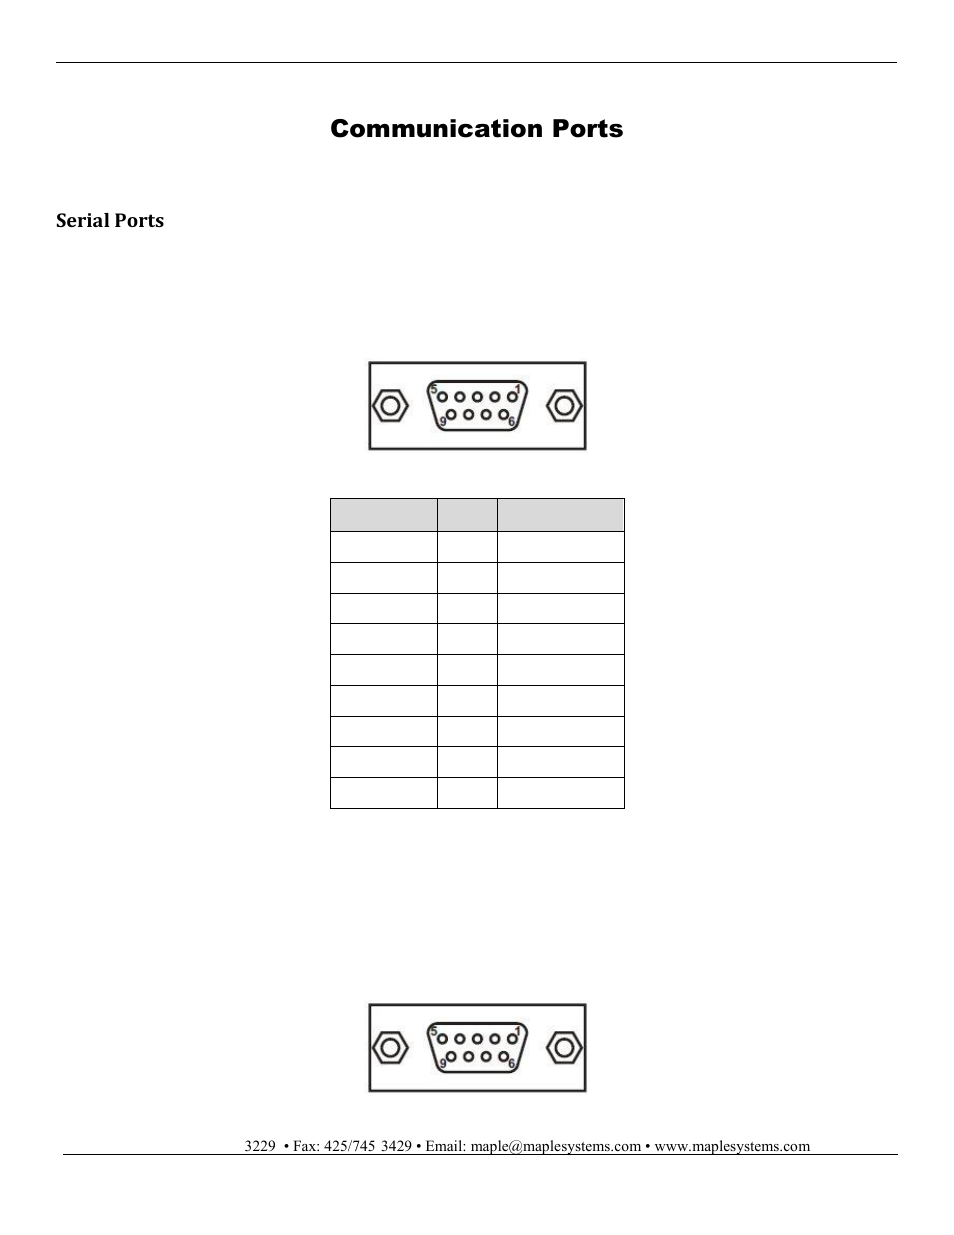 communication ports serial ports maple systems hmc7000 series rh manualsdir com Quick Reference Guide Quick Reference Guide